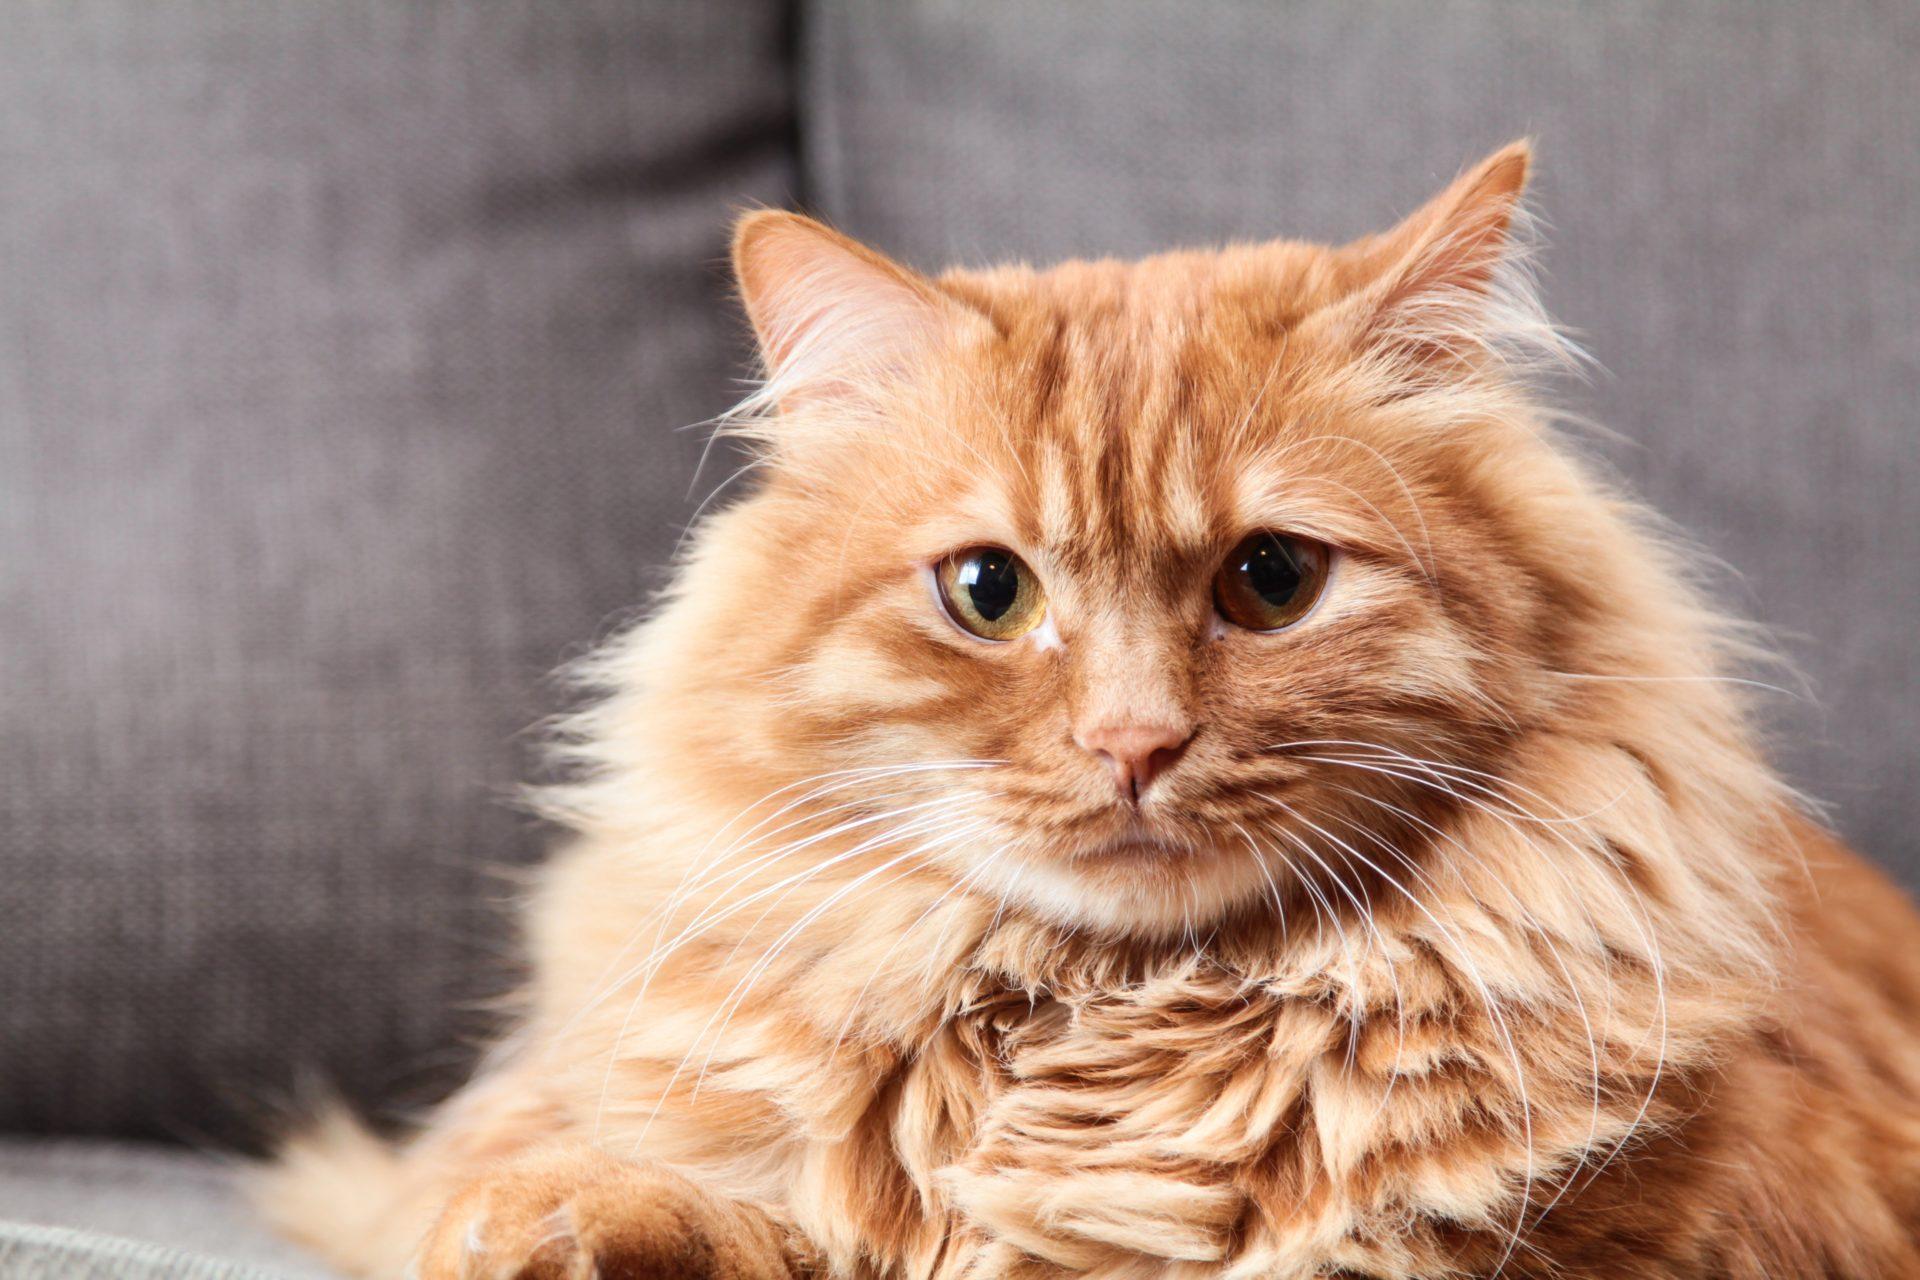 adorable-animal-cat-751050